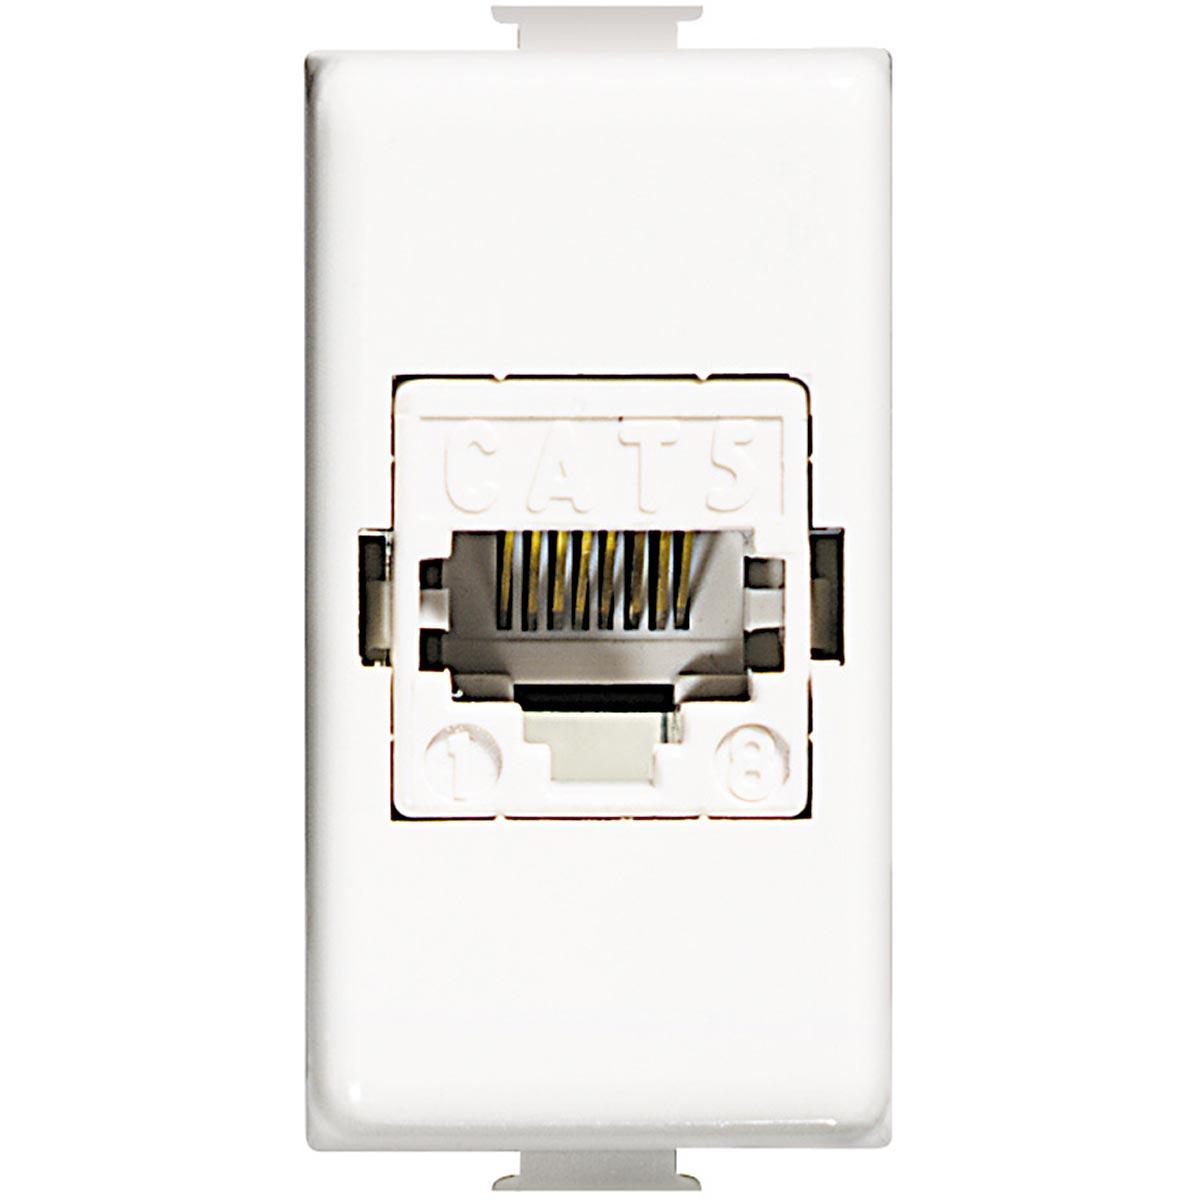 Connettore Modulare RJ45 Categoria 5E UTP Bticino Matix AM5974AT5